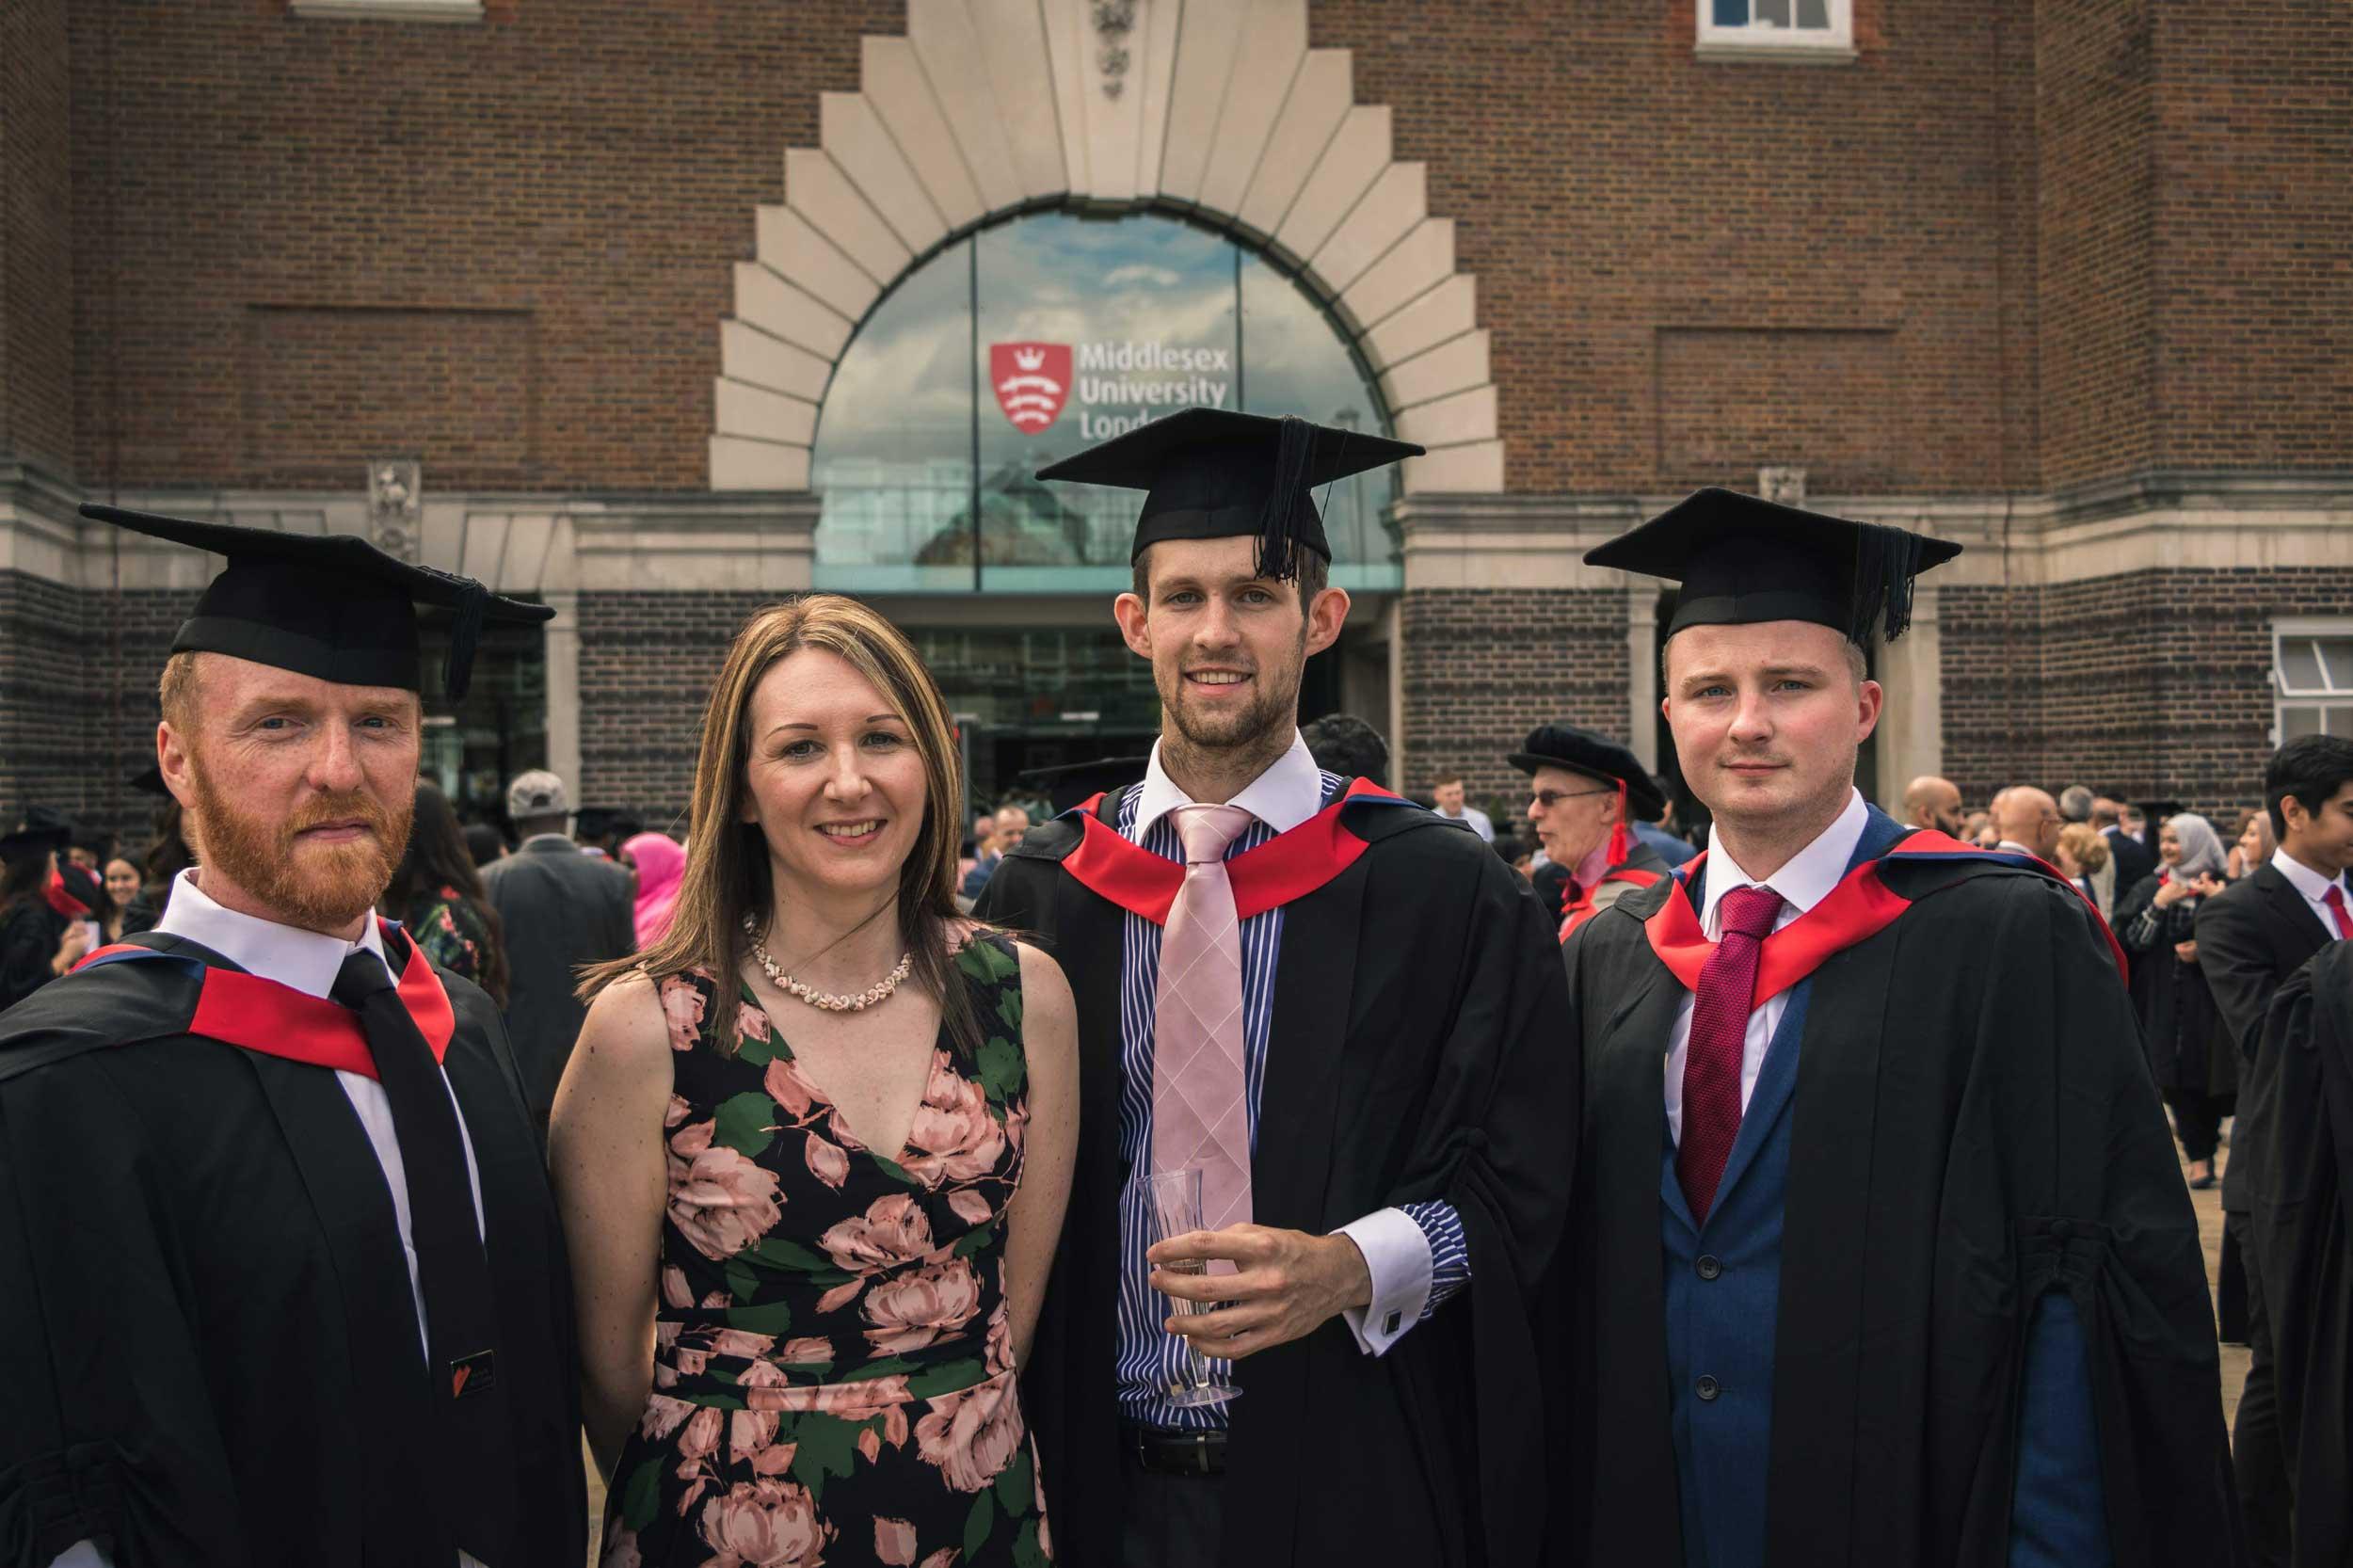 Helicentre graduates 2018